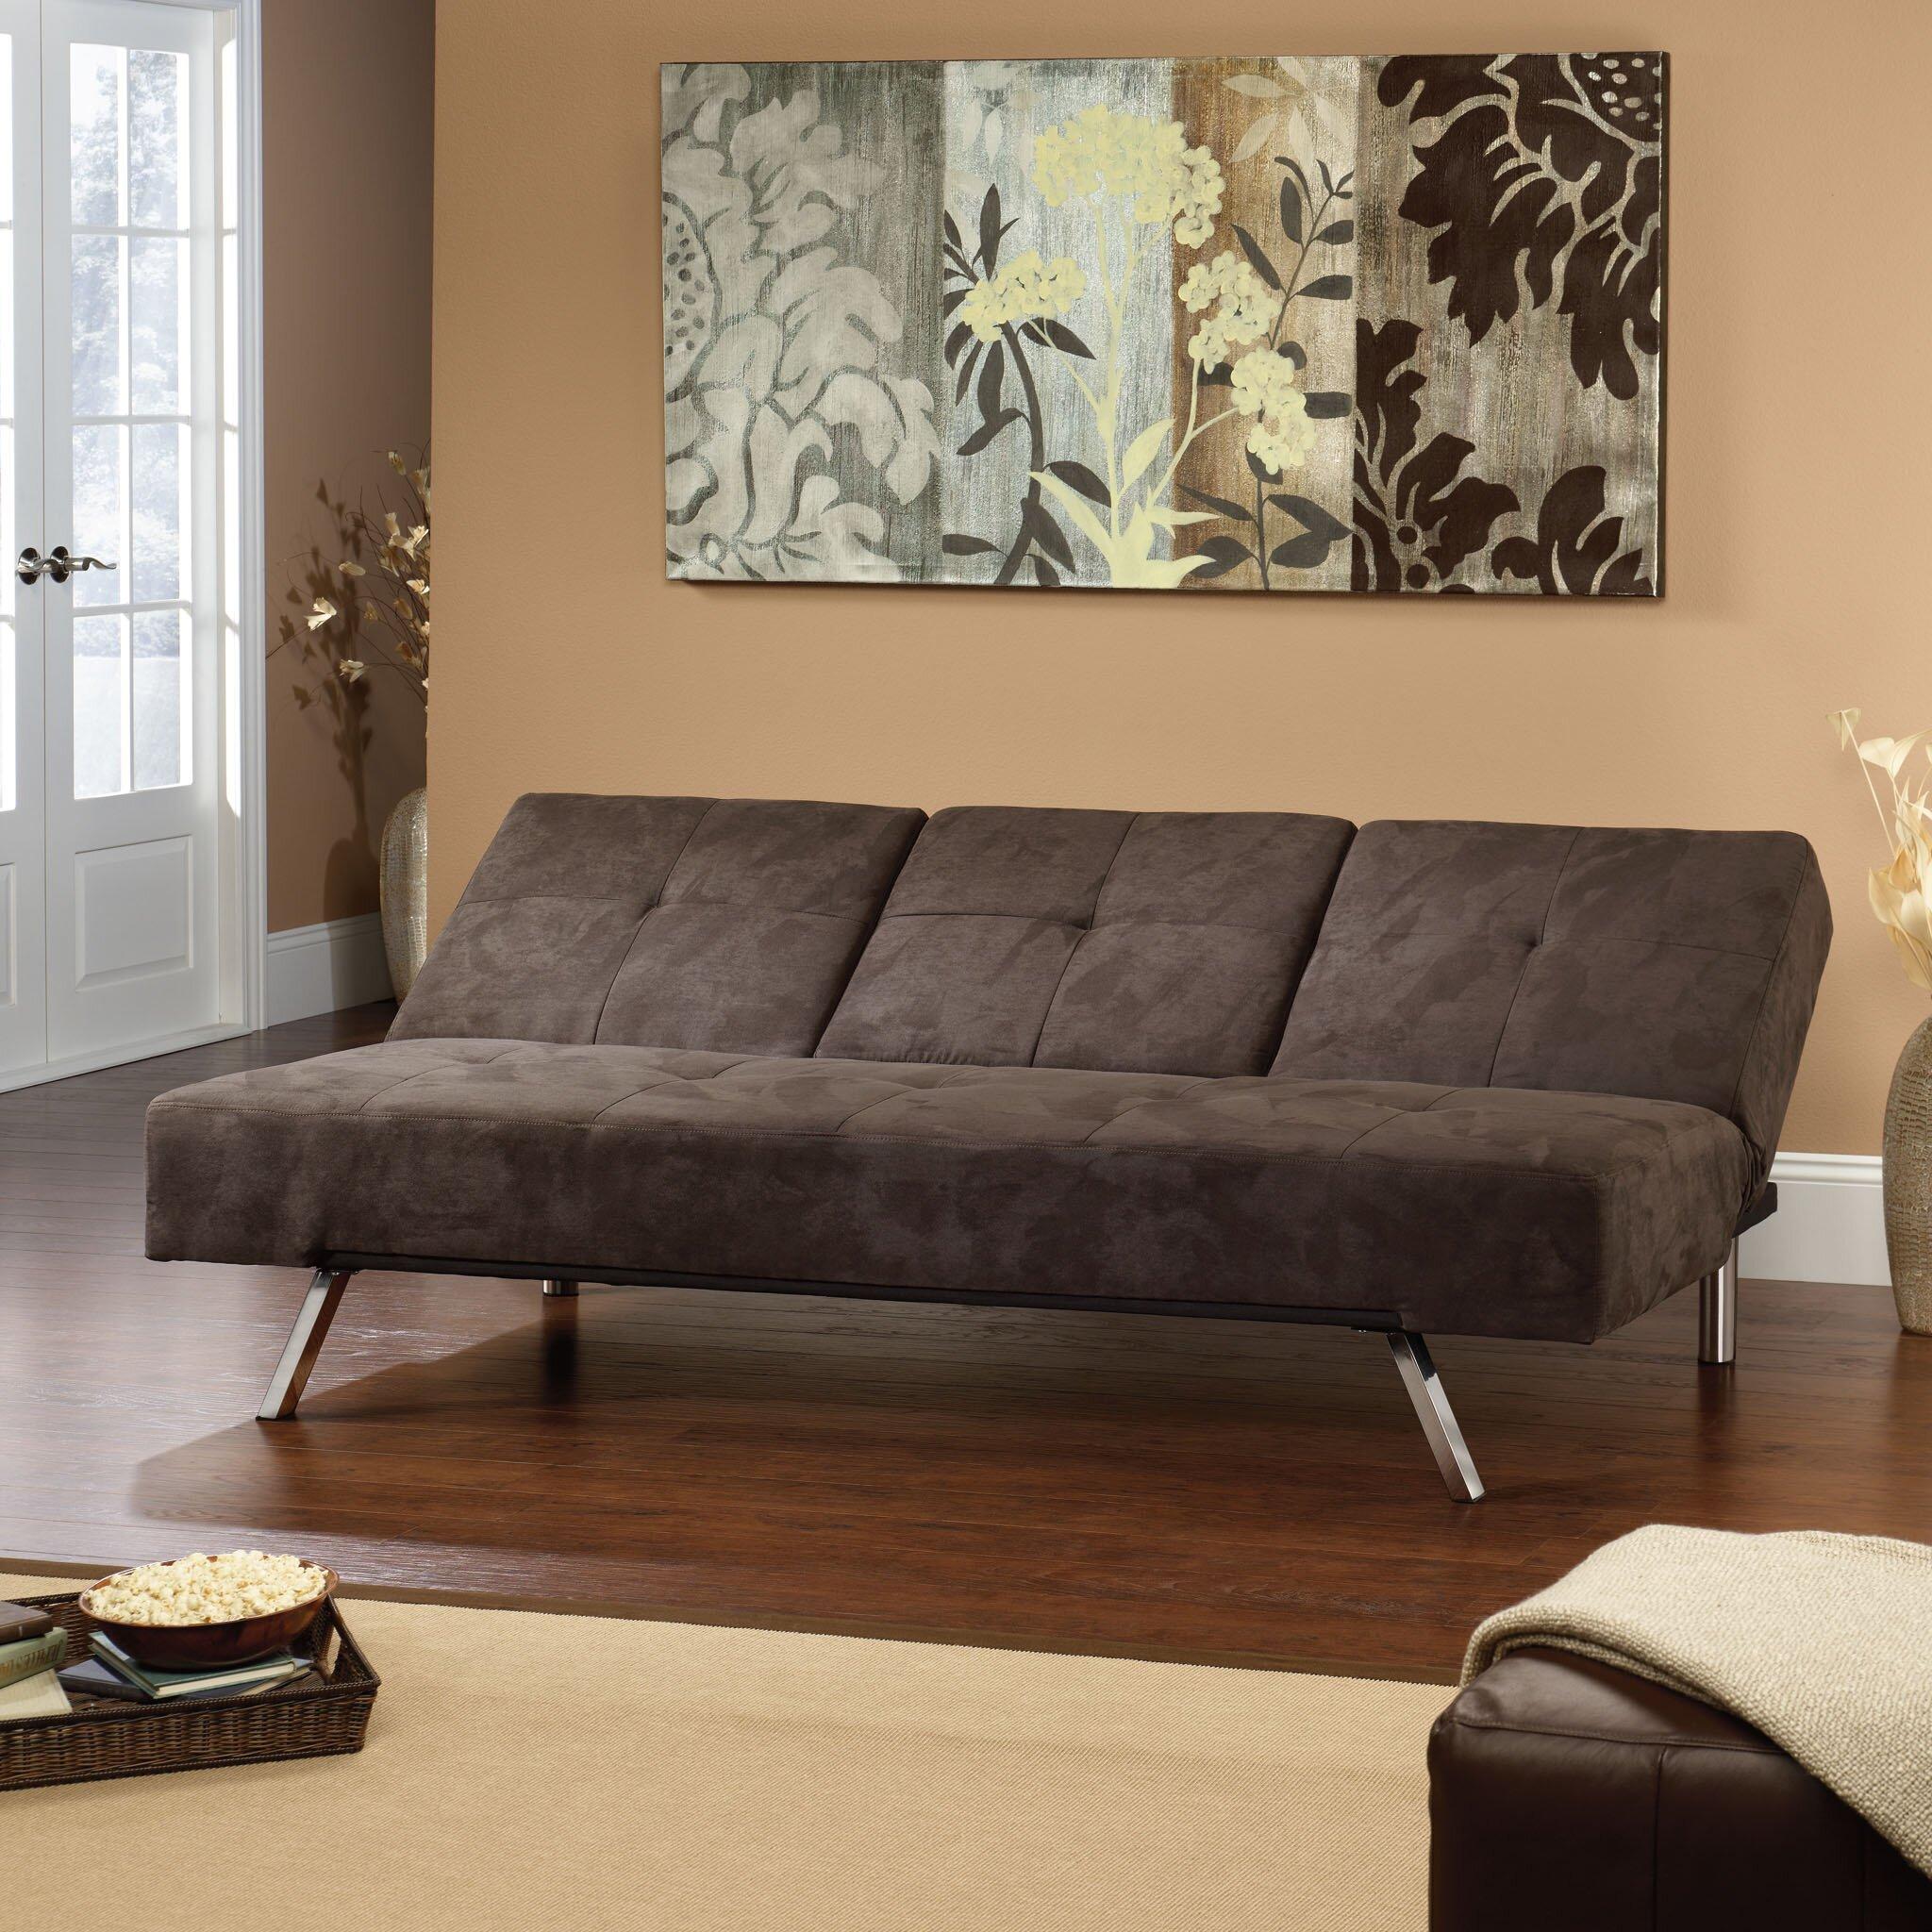 Sauder Bedroom Furniture Sauder Hunter Sleeper Sofa Reviews Wayfair